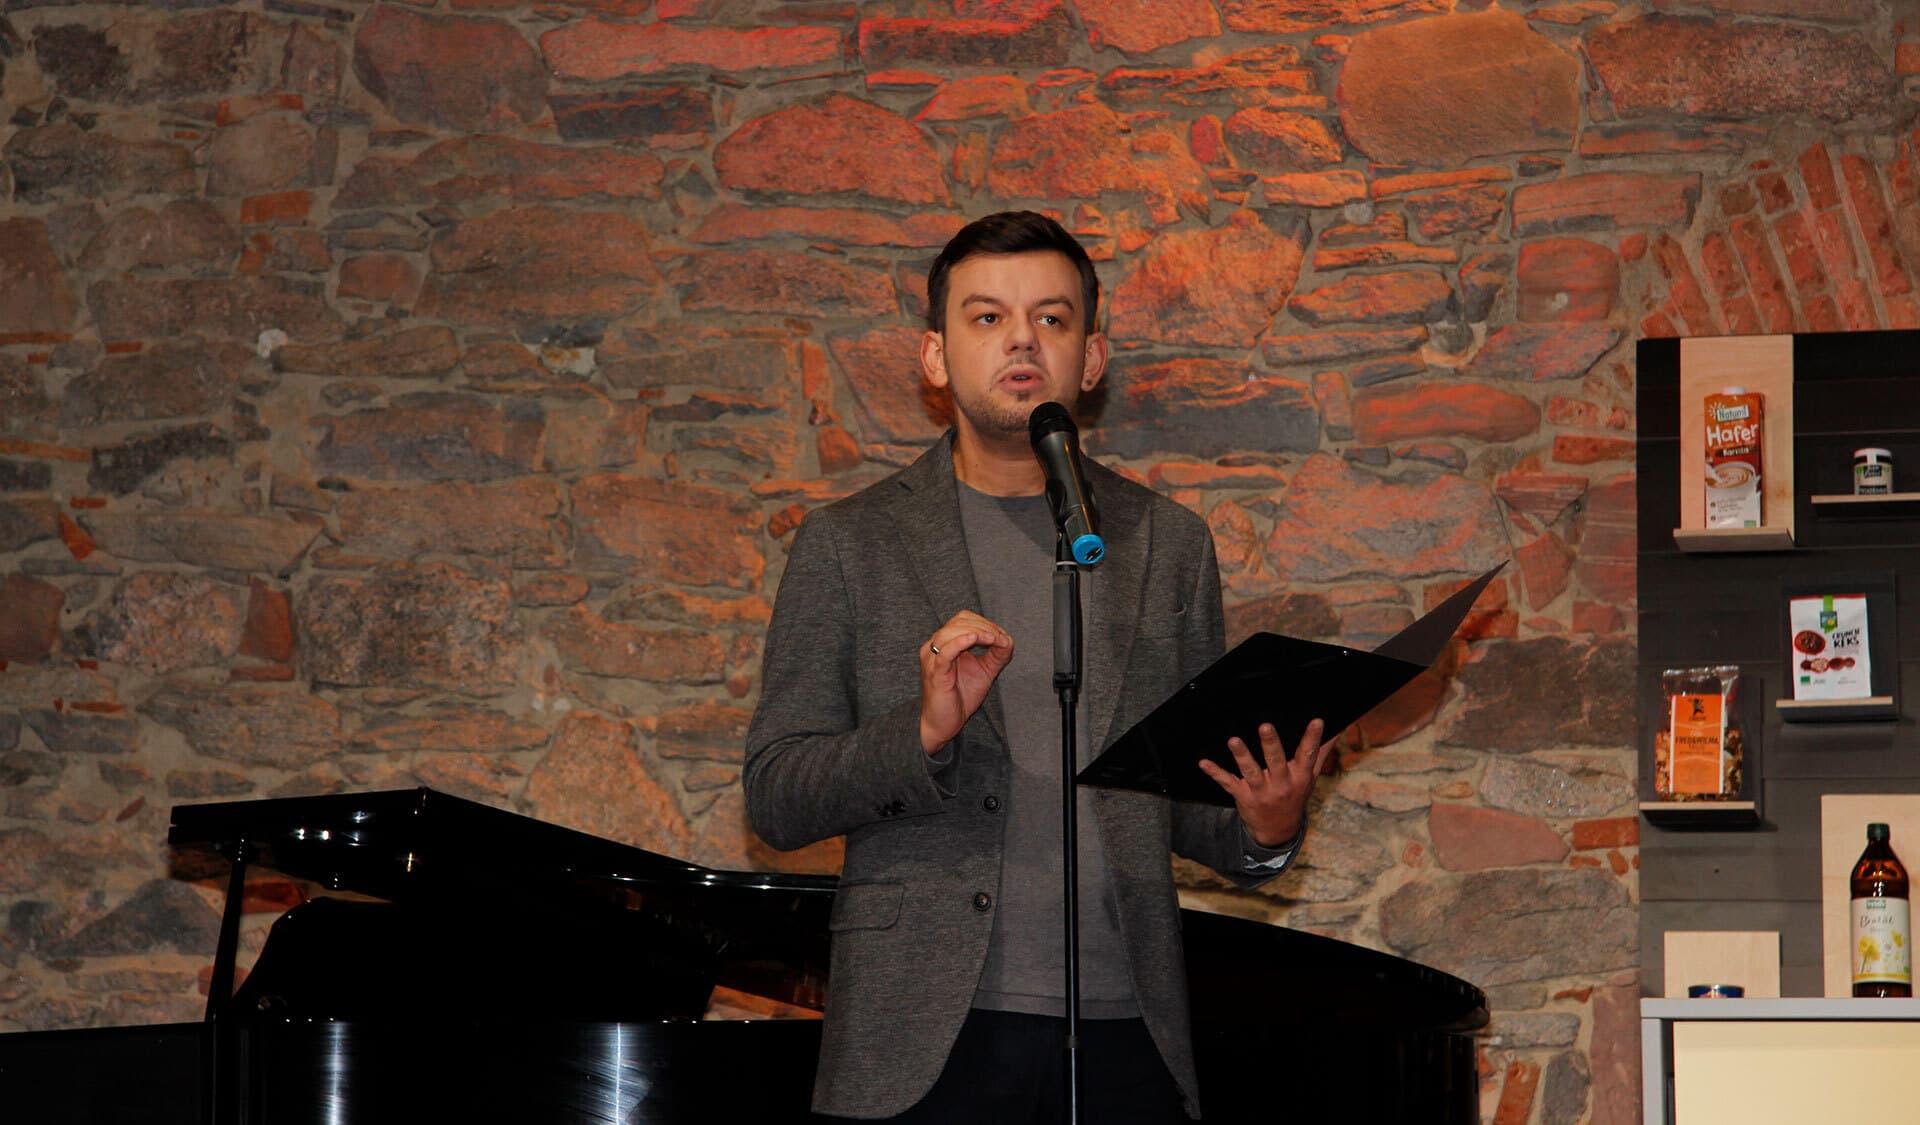 Poetry-Slammer Marius Loy beim Vortrag